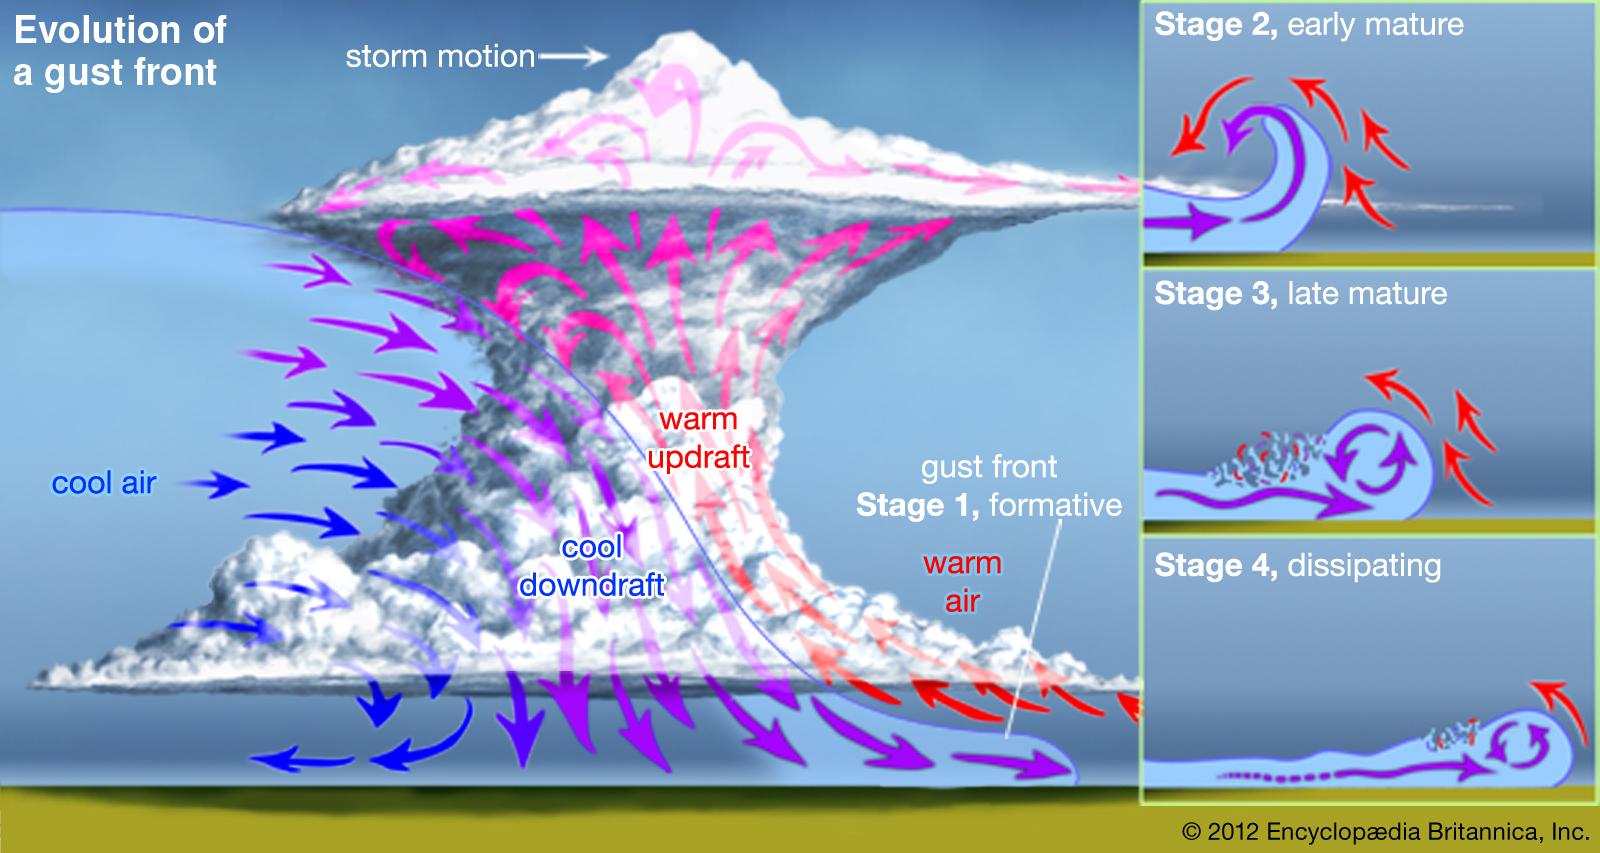 gust-front-Evolution-thunderstorm-column-thundercloud-air.jpg